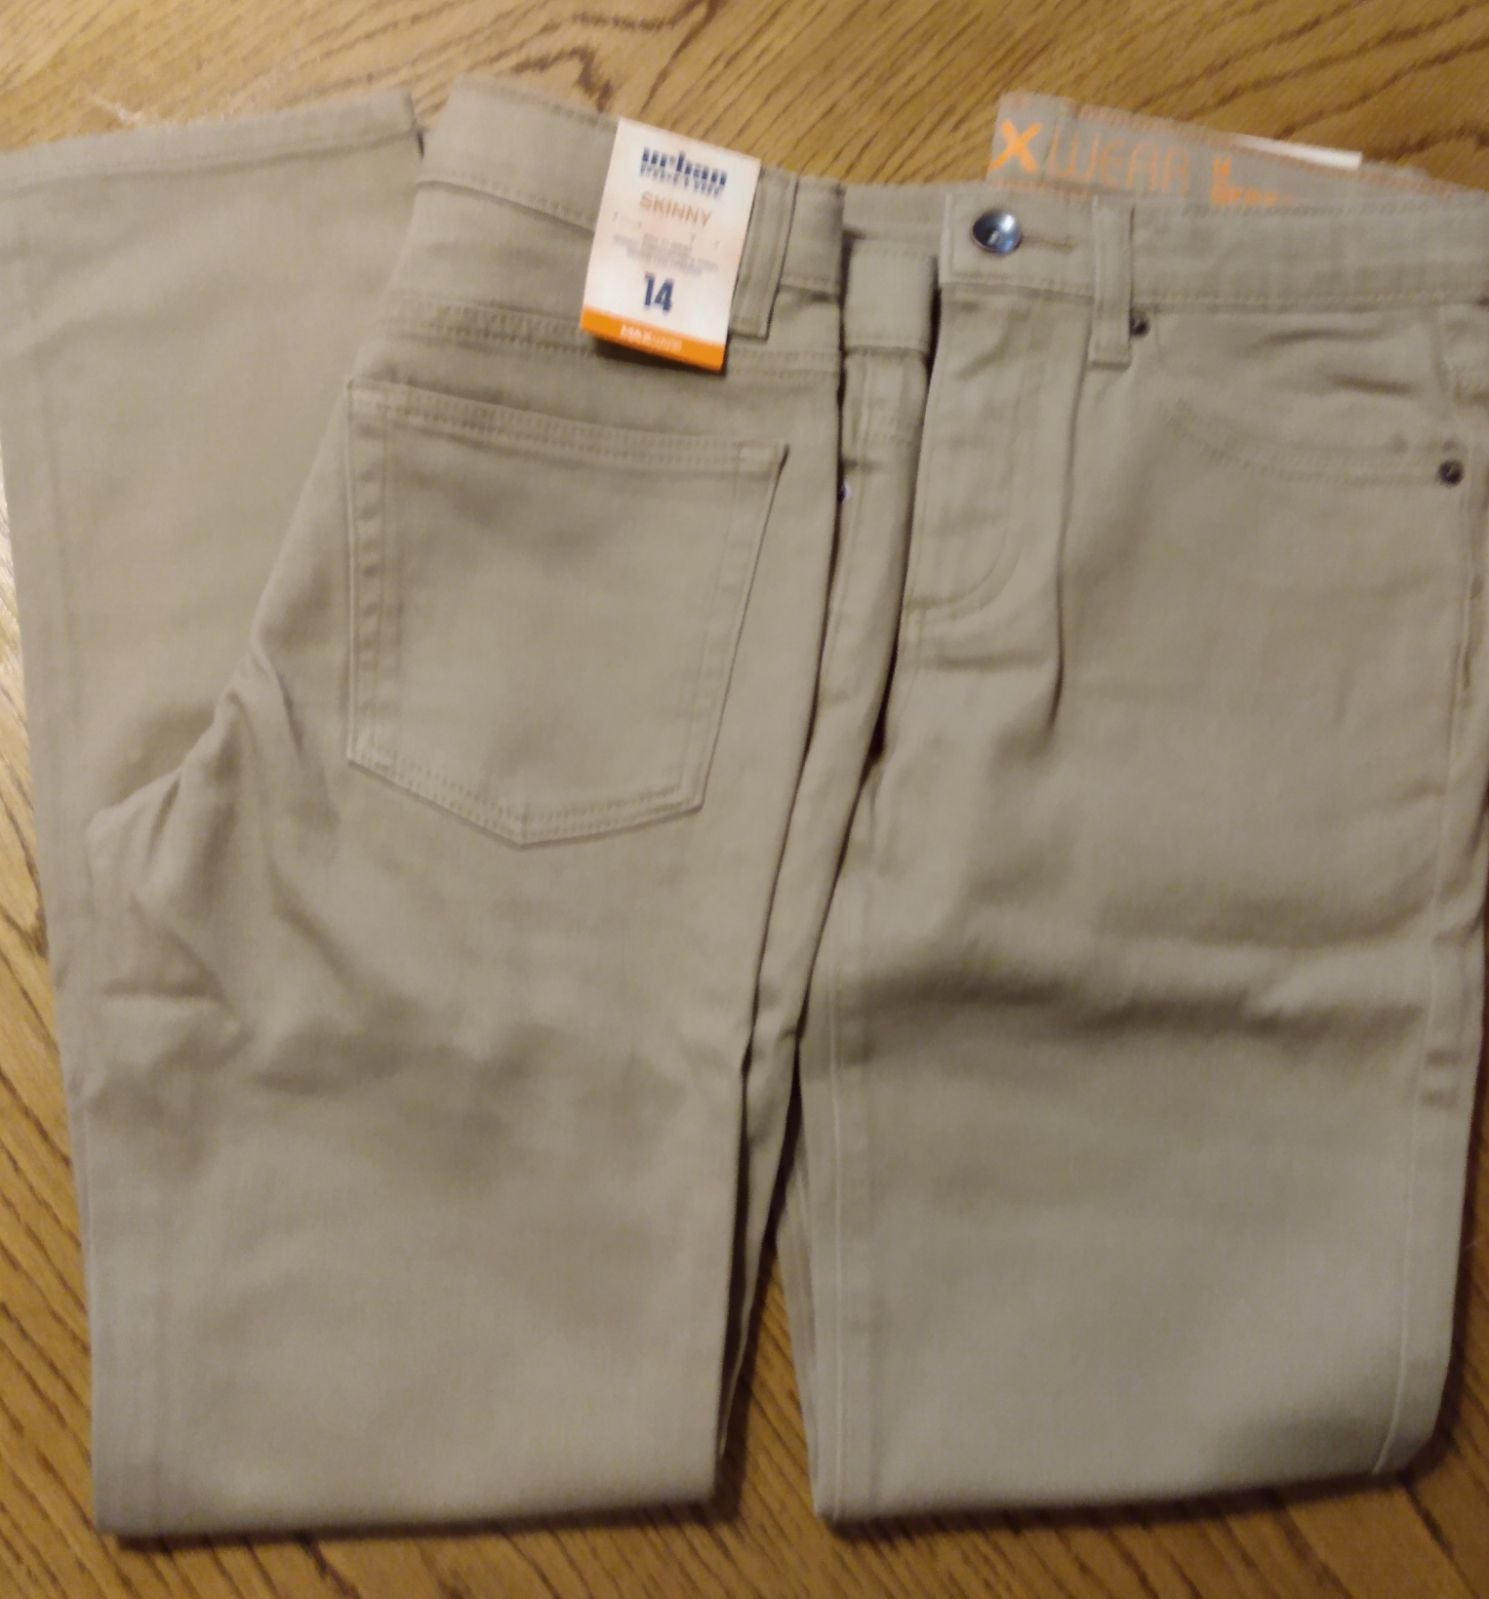 2 pairs boys skinny jeans, khaki, size 1